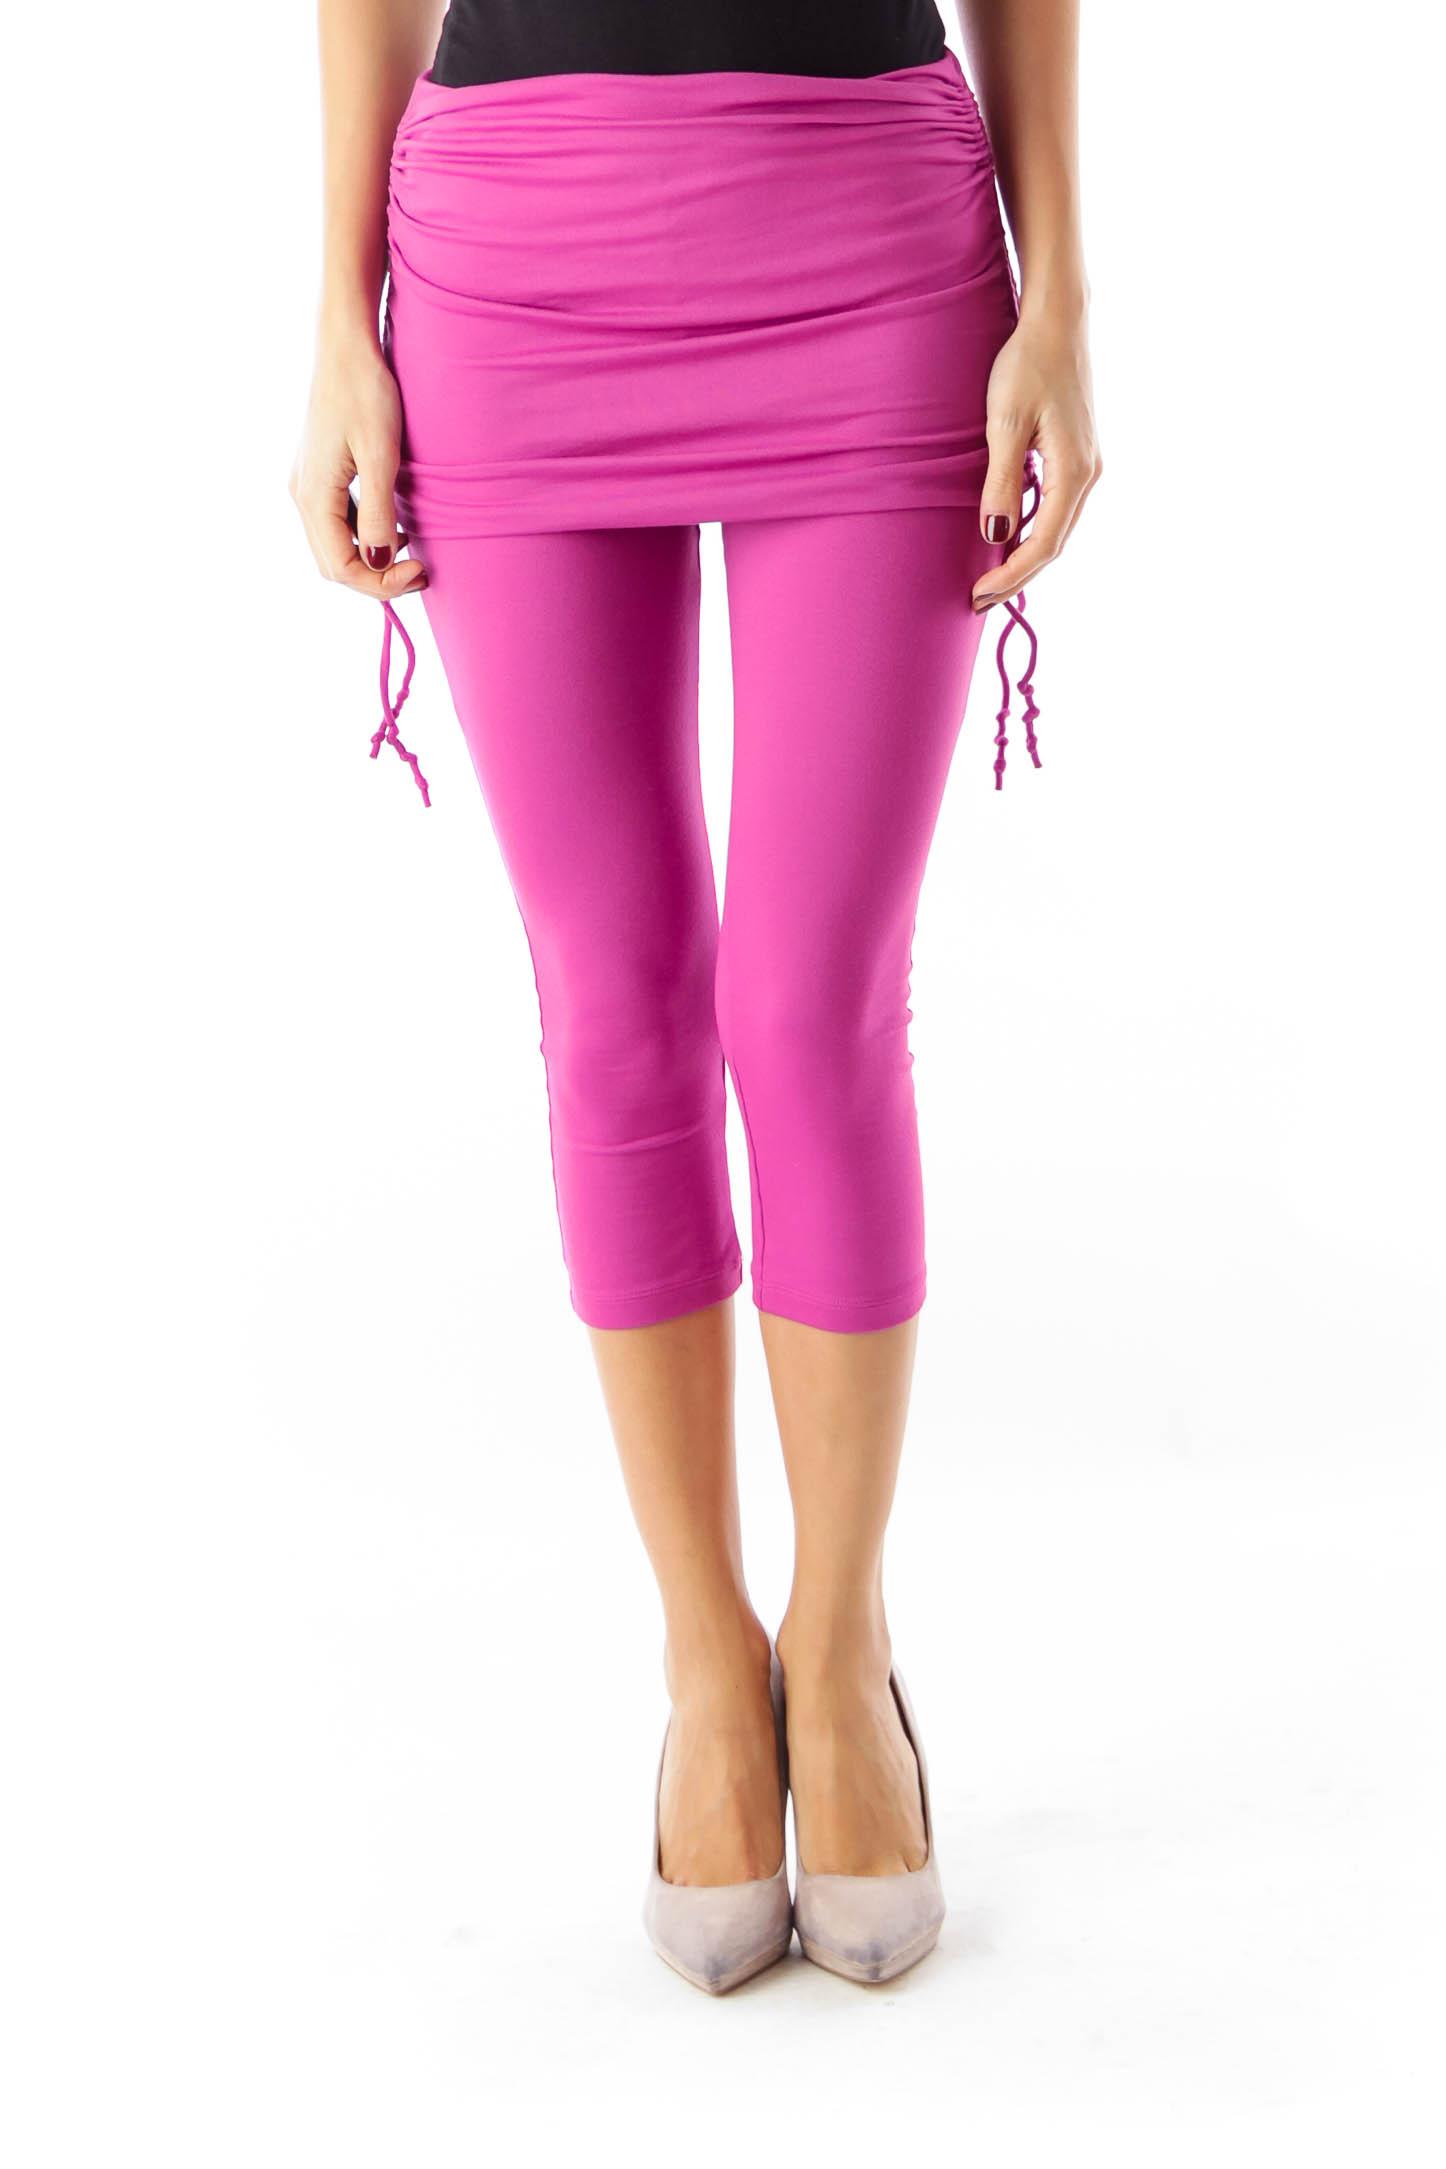 Purple Capri Leggings